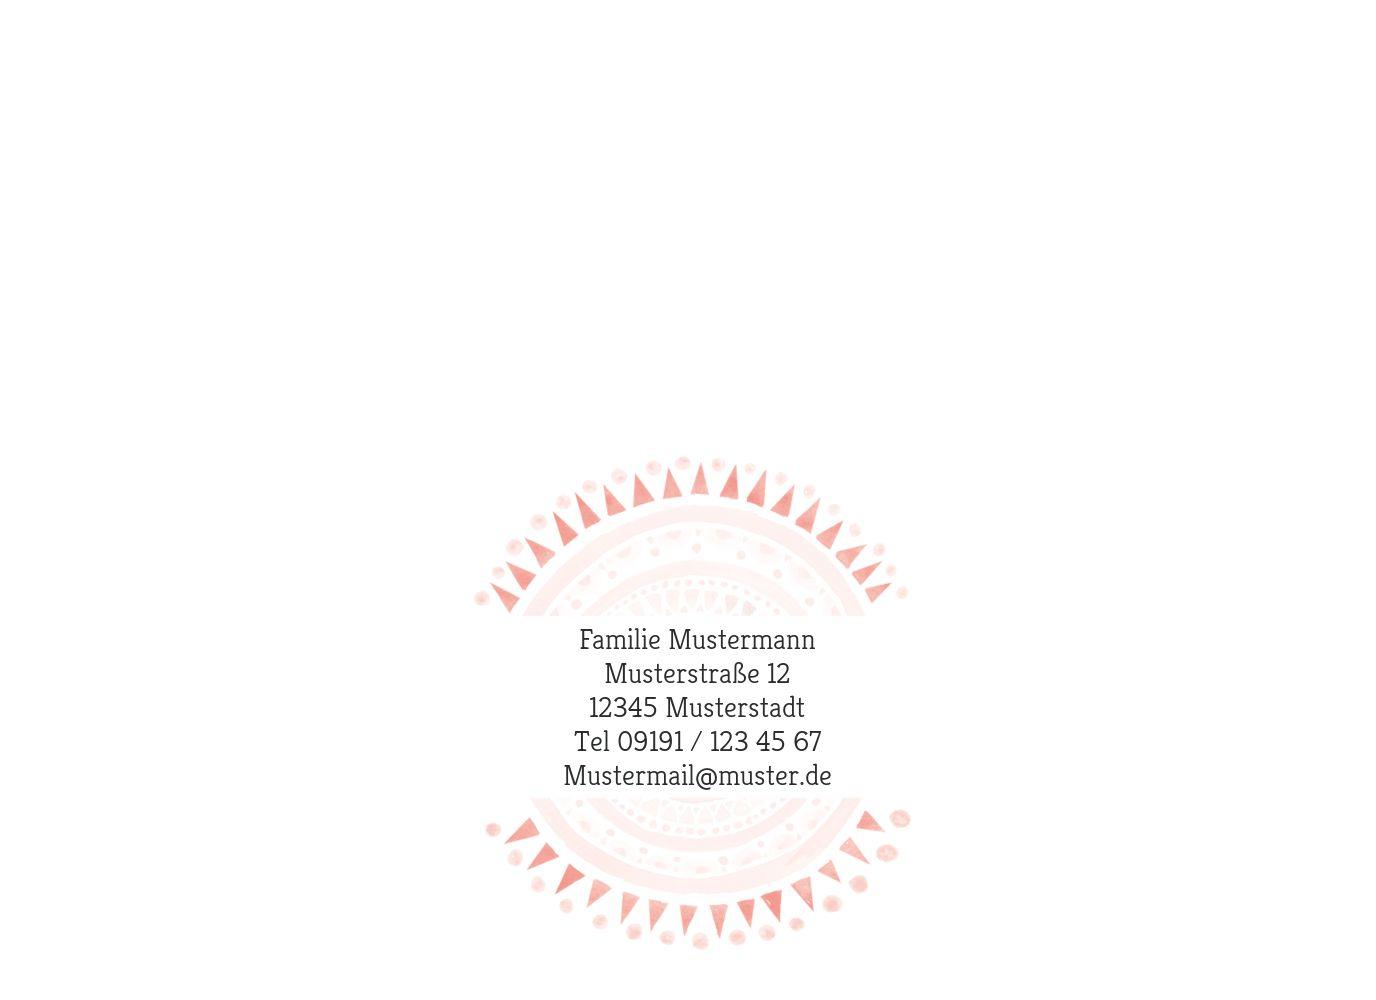 Ansicht 2 - Glückwunschkarte zur Geburt Mandala